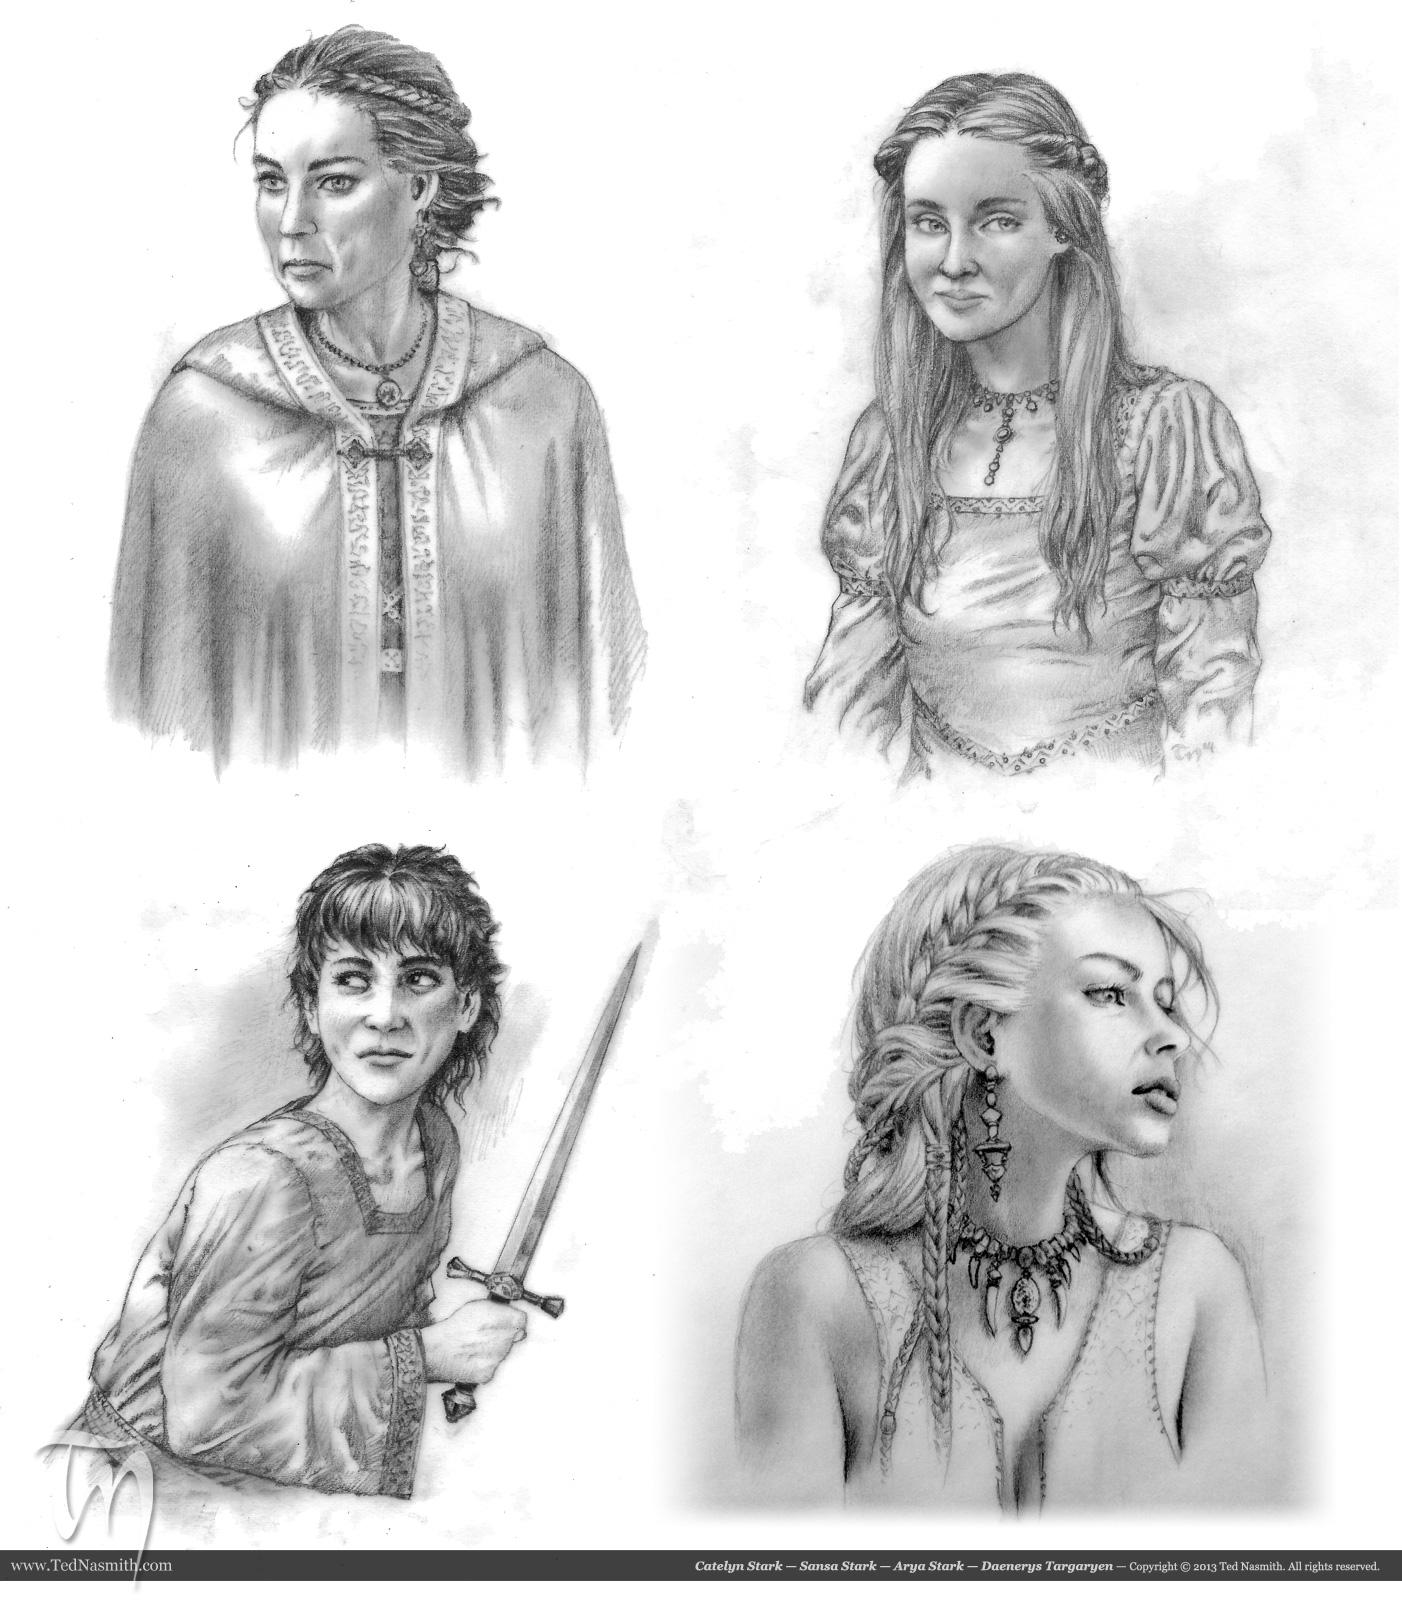 catelyn sansa arya daenerys � ted nasmith